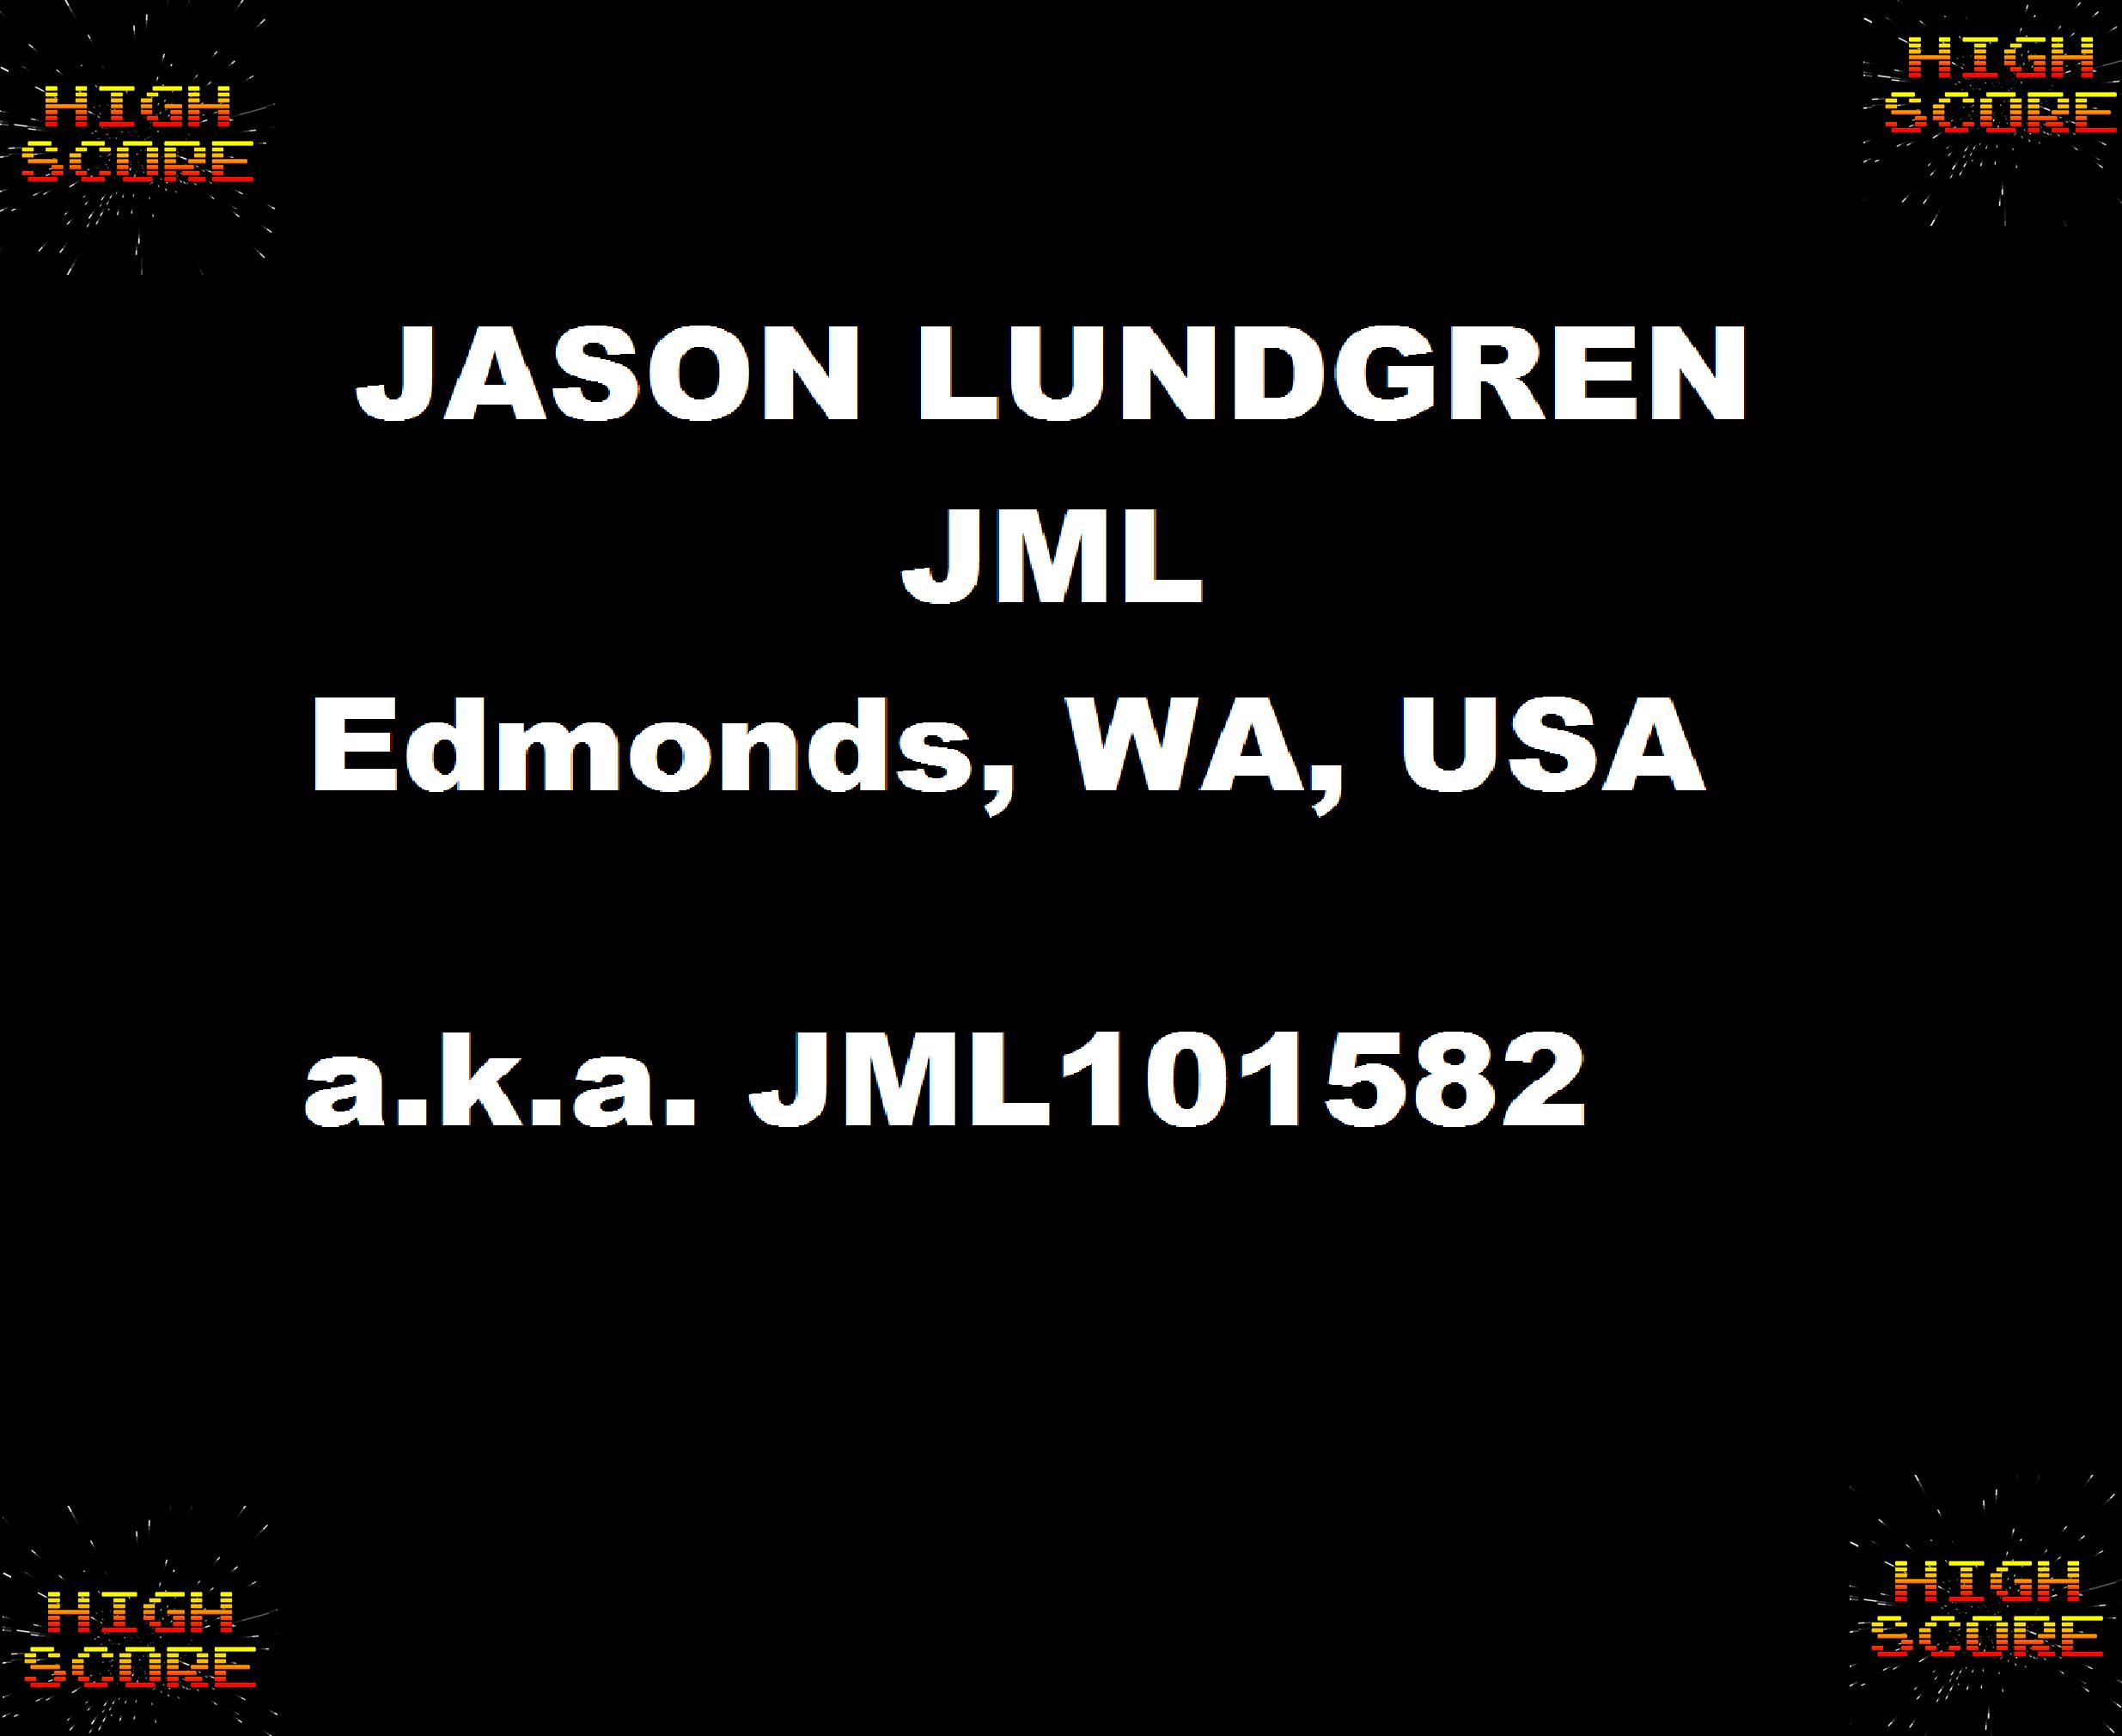 JML101582: RBI Baseball 4 [Home Run Derby] [Most Home Runs] (Sega Genesis / MegaDrive Emulated) 3 points on 2019-07-07 18:07:46